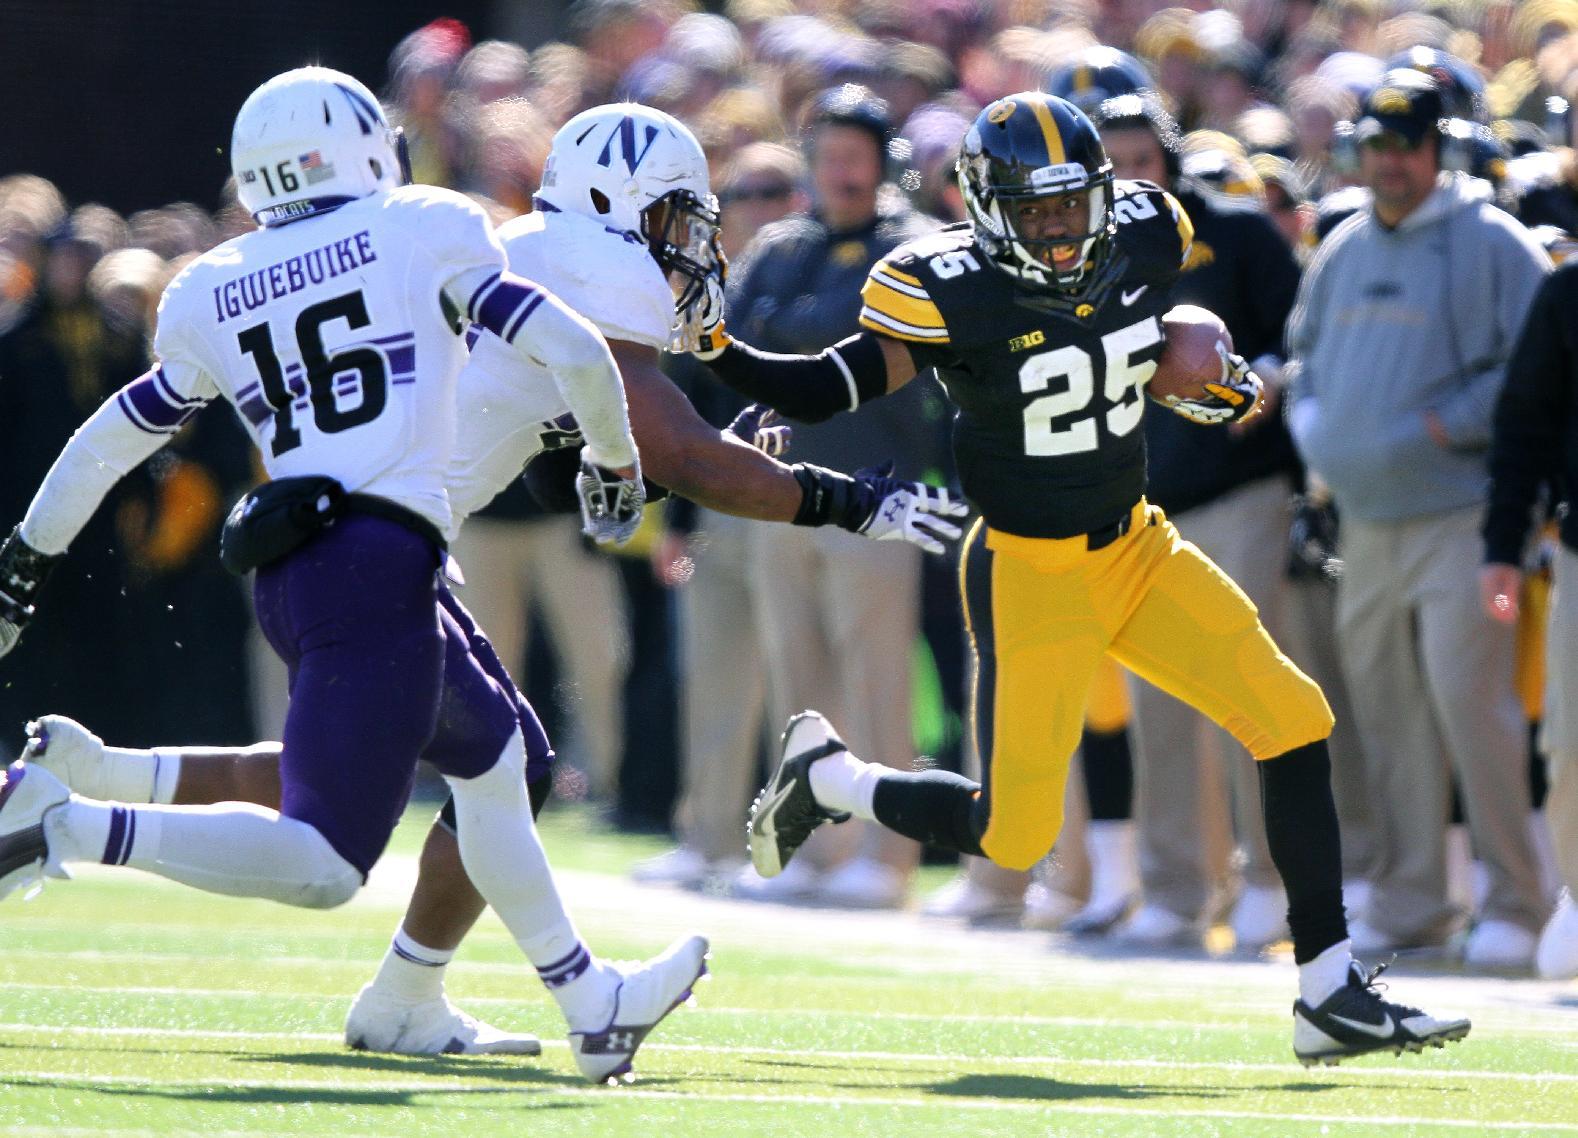 Iowa running back Akrum Wadley (25) stiff arms Northwestern linebacker Chi Chi Ariguzo (44). Saturday, Nov. 1, 2014, in Iowa City, Iowa . (AP Photo/Justin Hayworth)